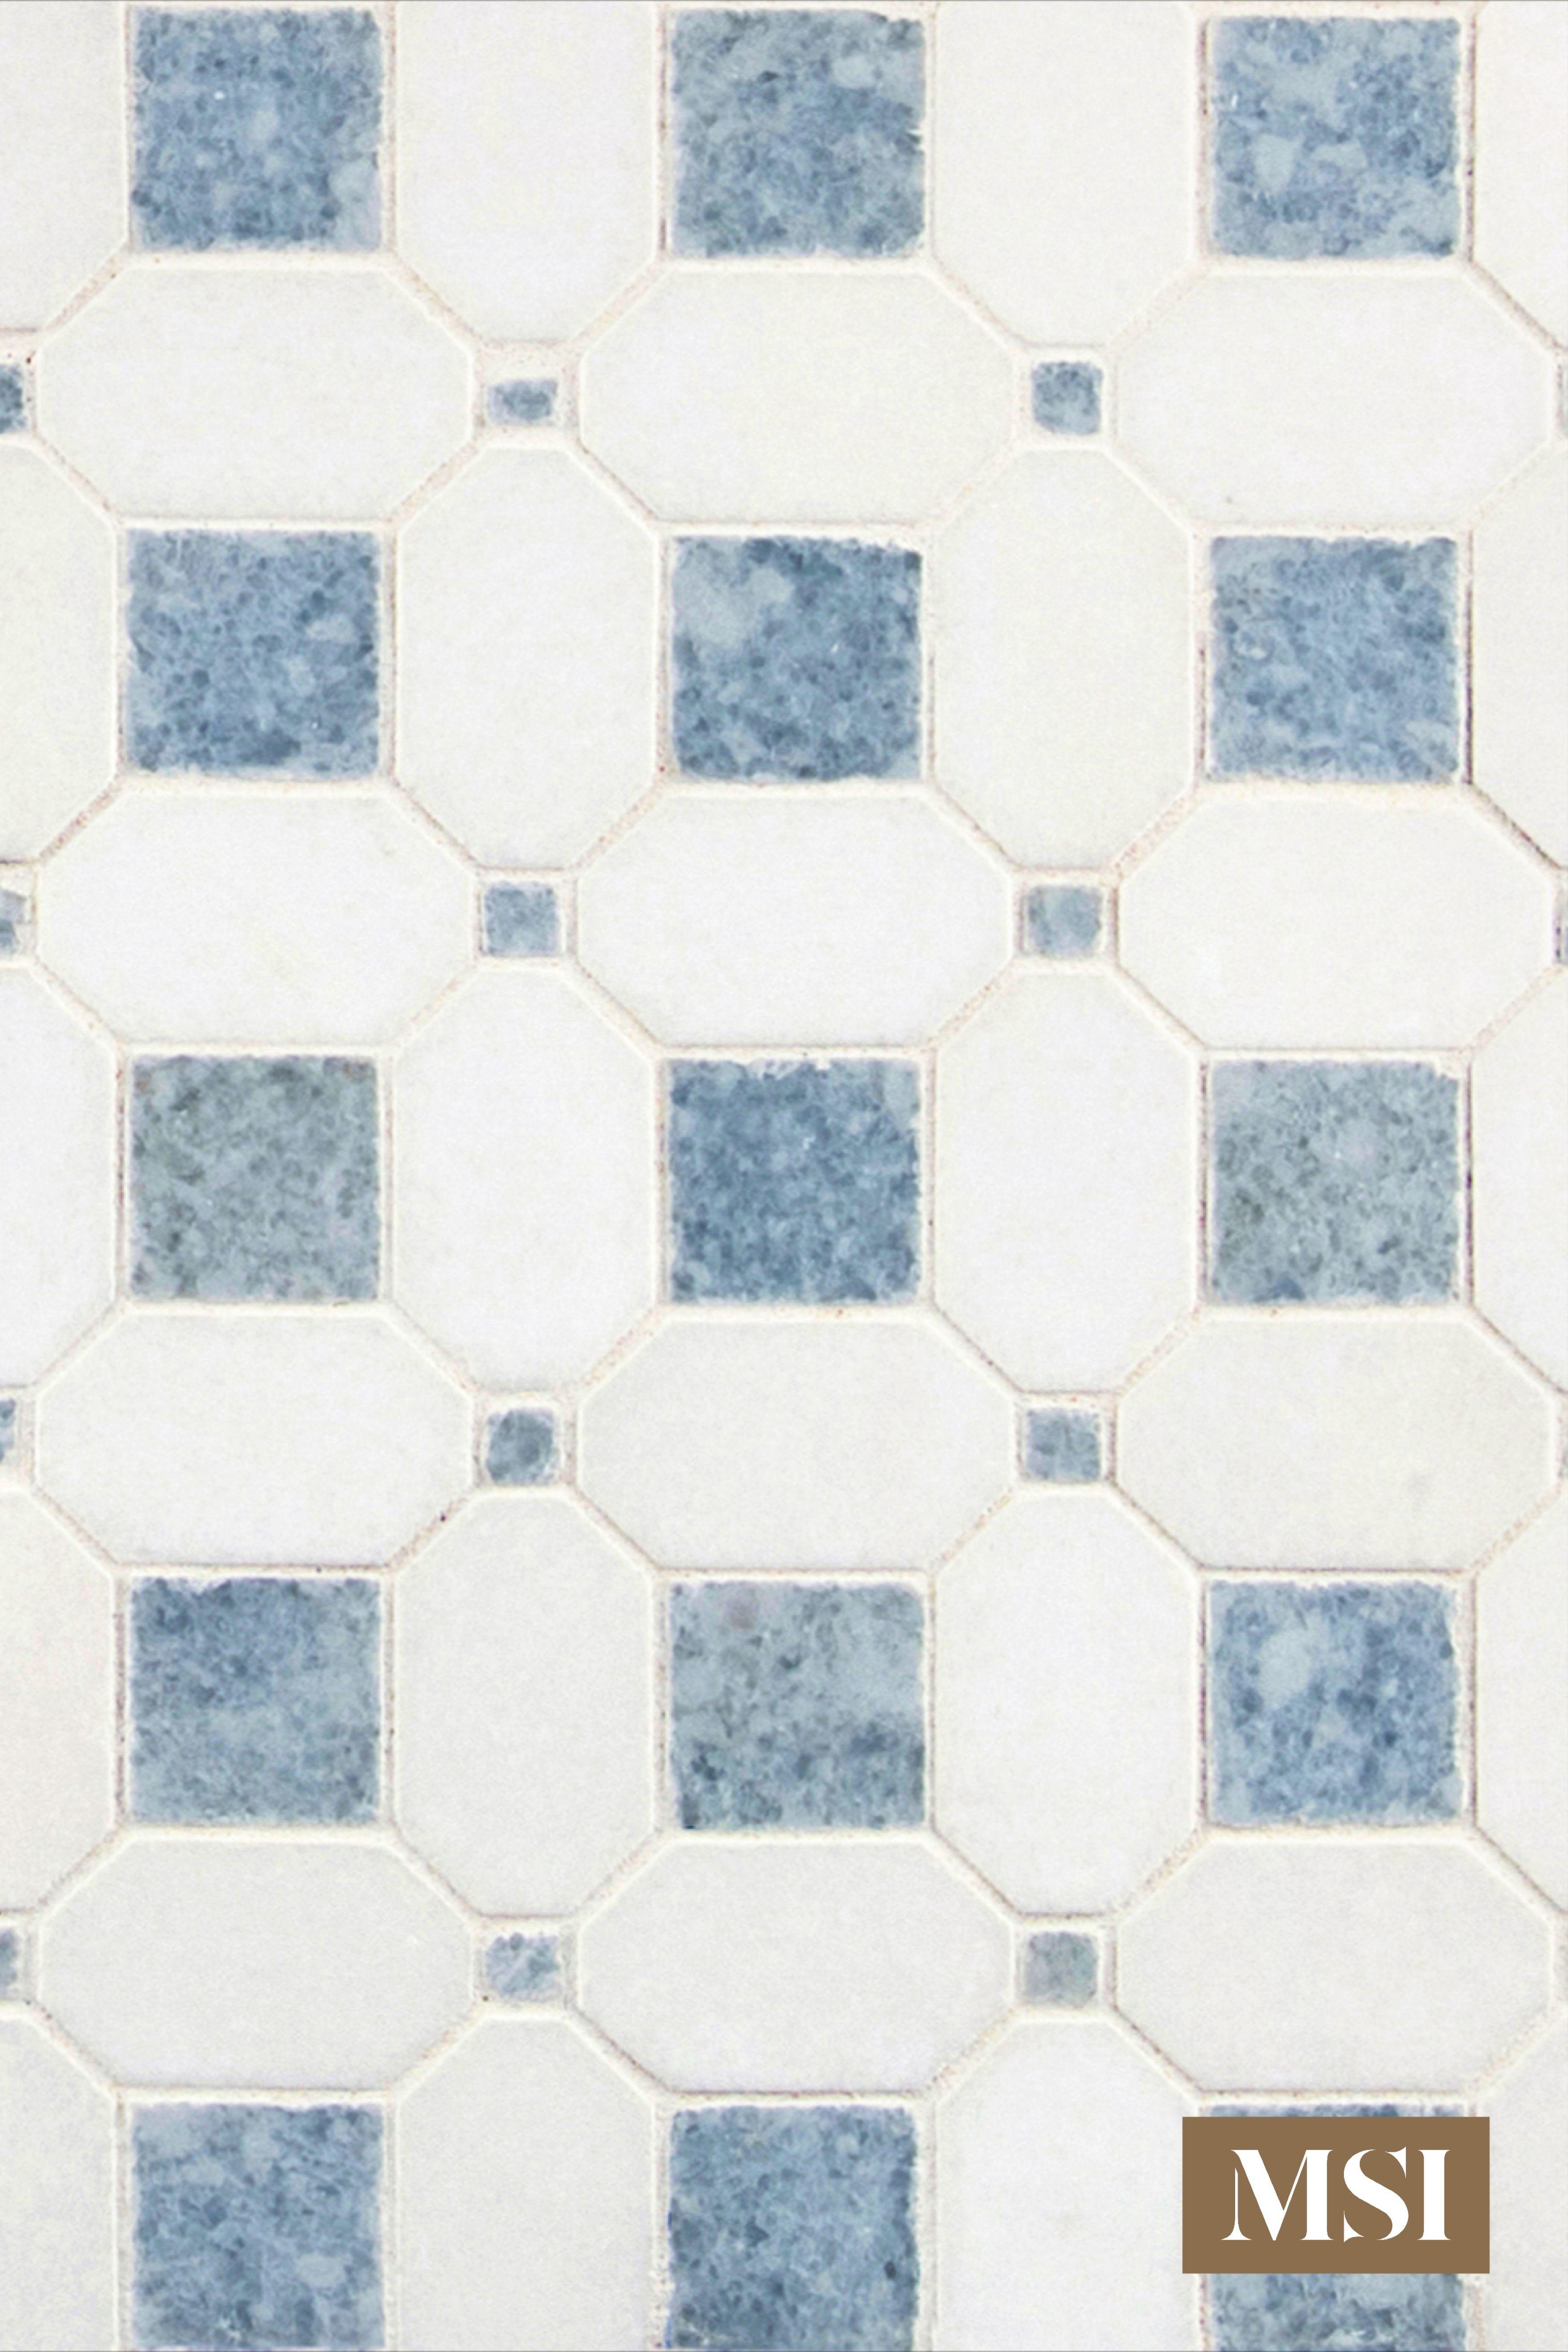 Azula Hatchwork Marble Tile In 2020 Geometric Floor Colorful Tile Floor Patterned Wall Tiles